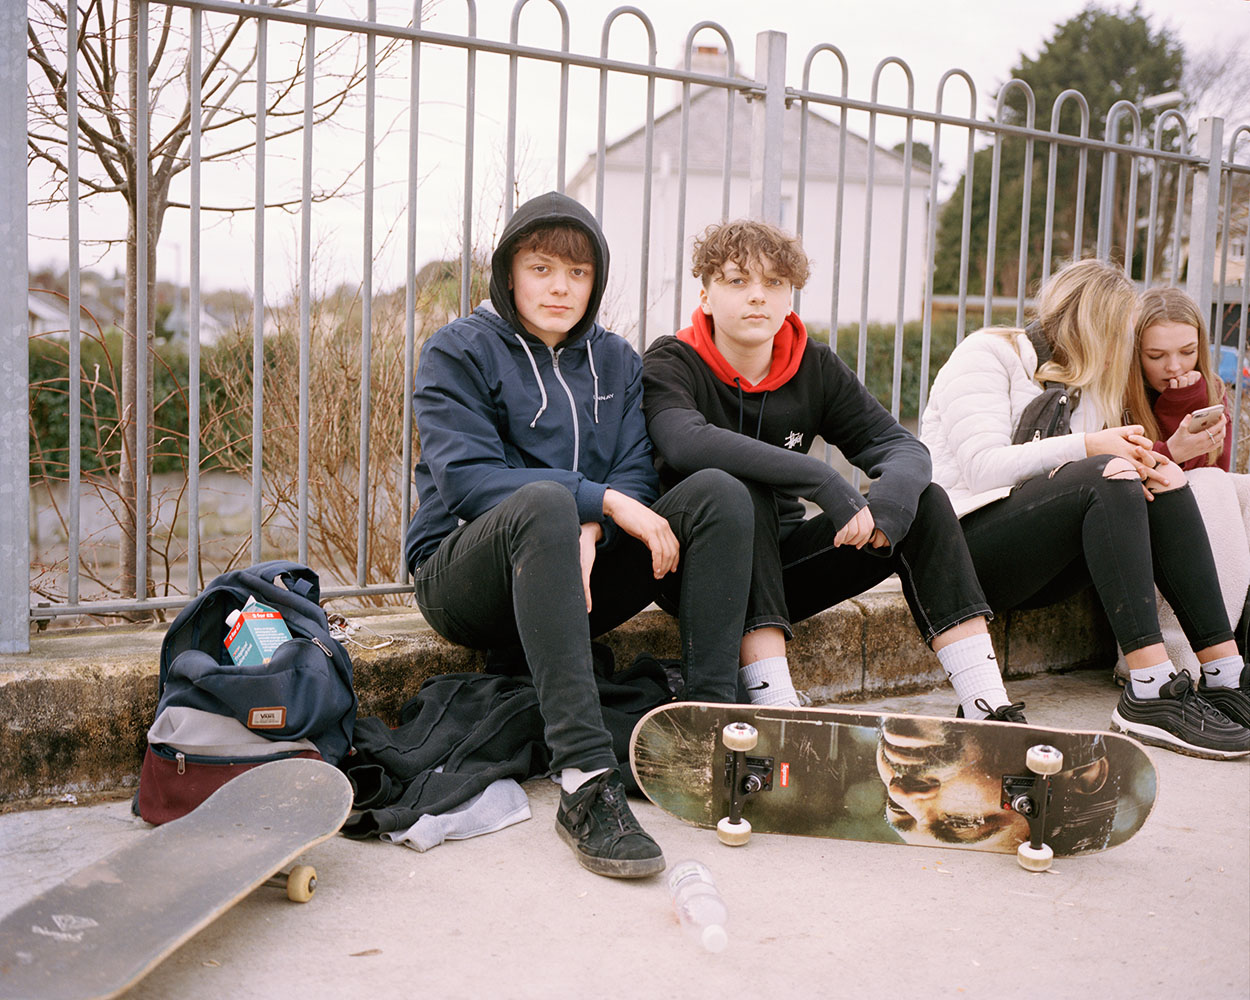 Cornish Skaters 05.jpg